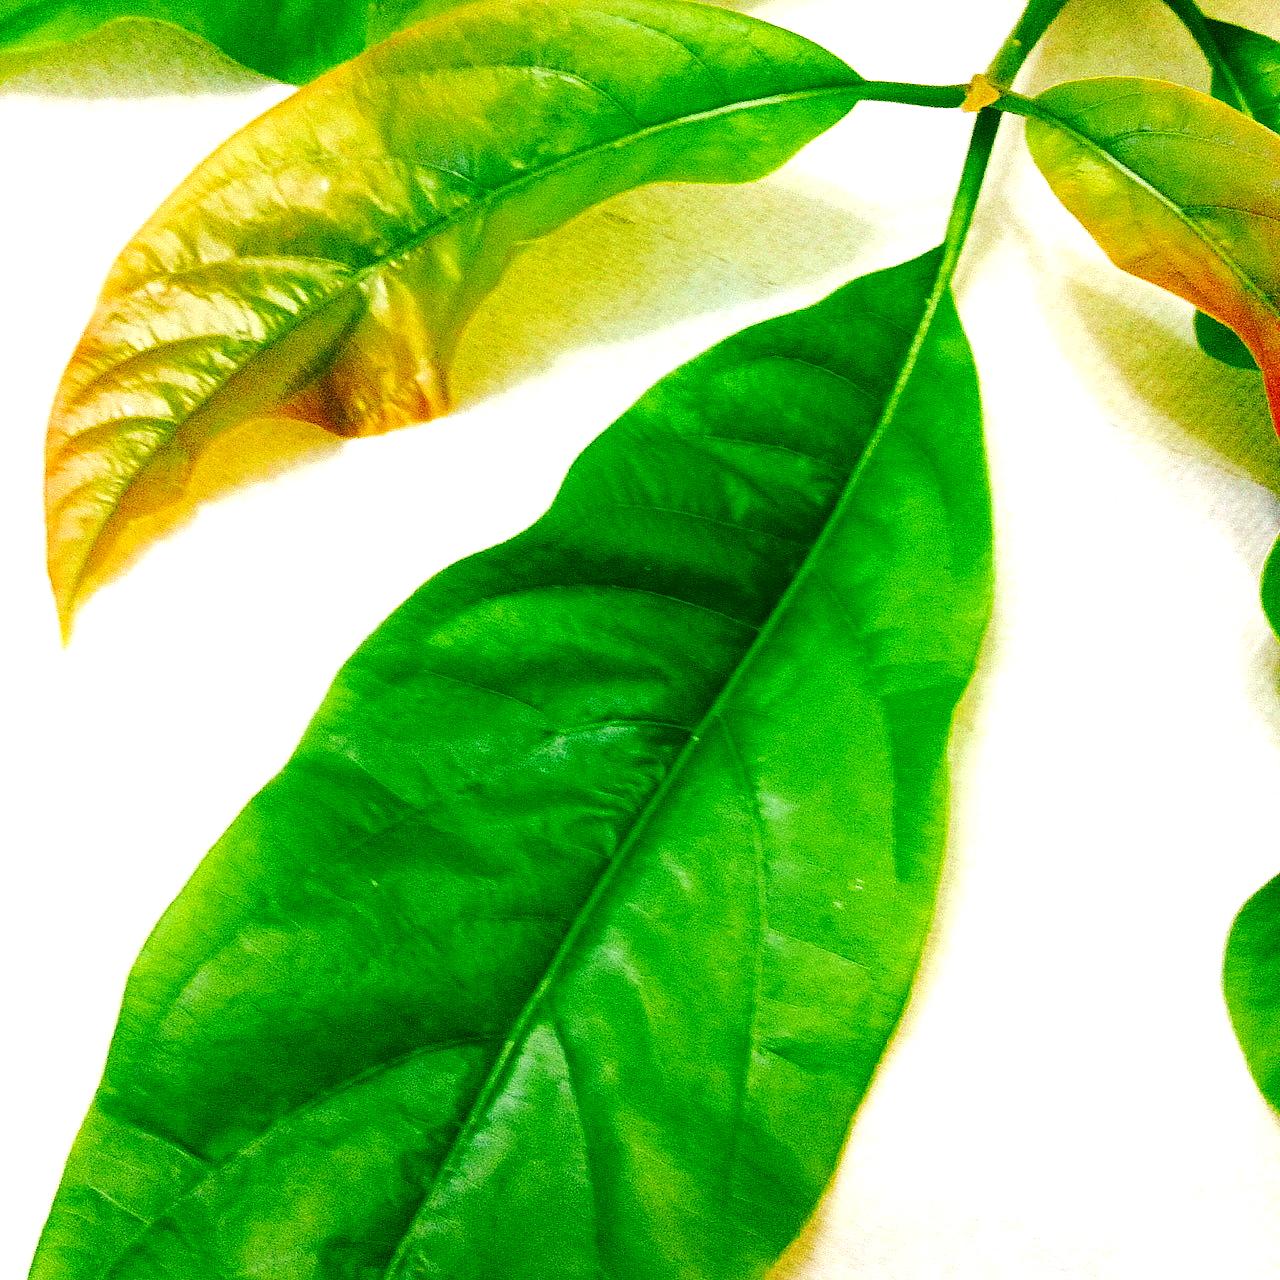 Avocado Health Benefits List